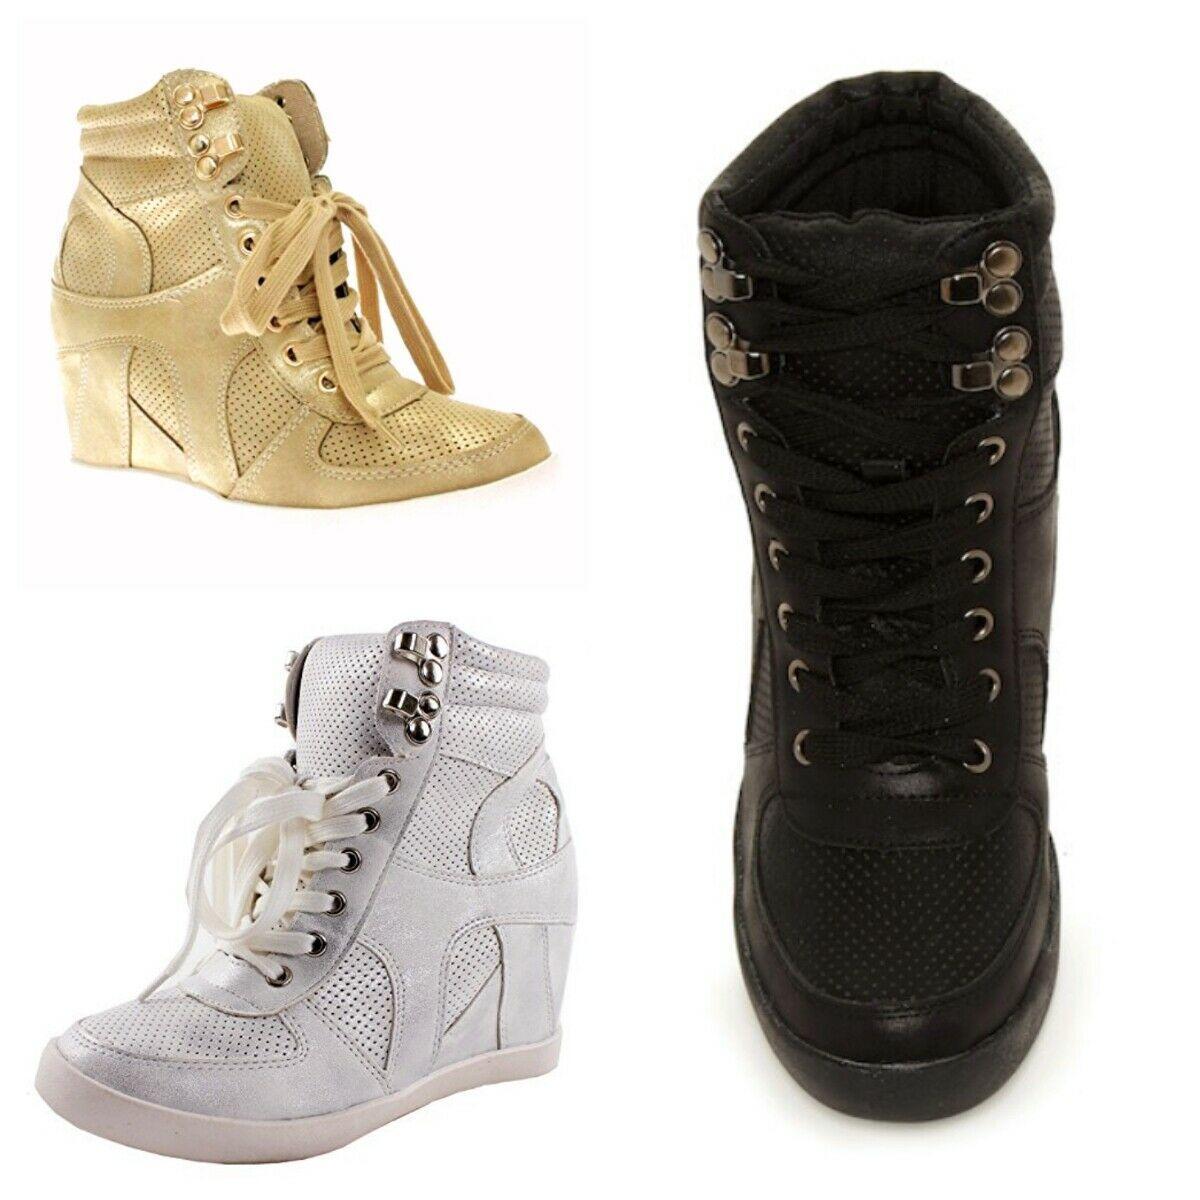 Top Moda Eric-9 Women's High Top Lace Up Fashion Sneaker Wedge Booties - $24.98